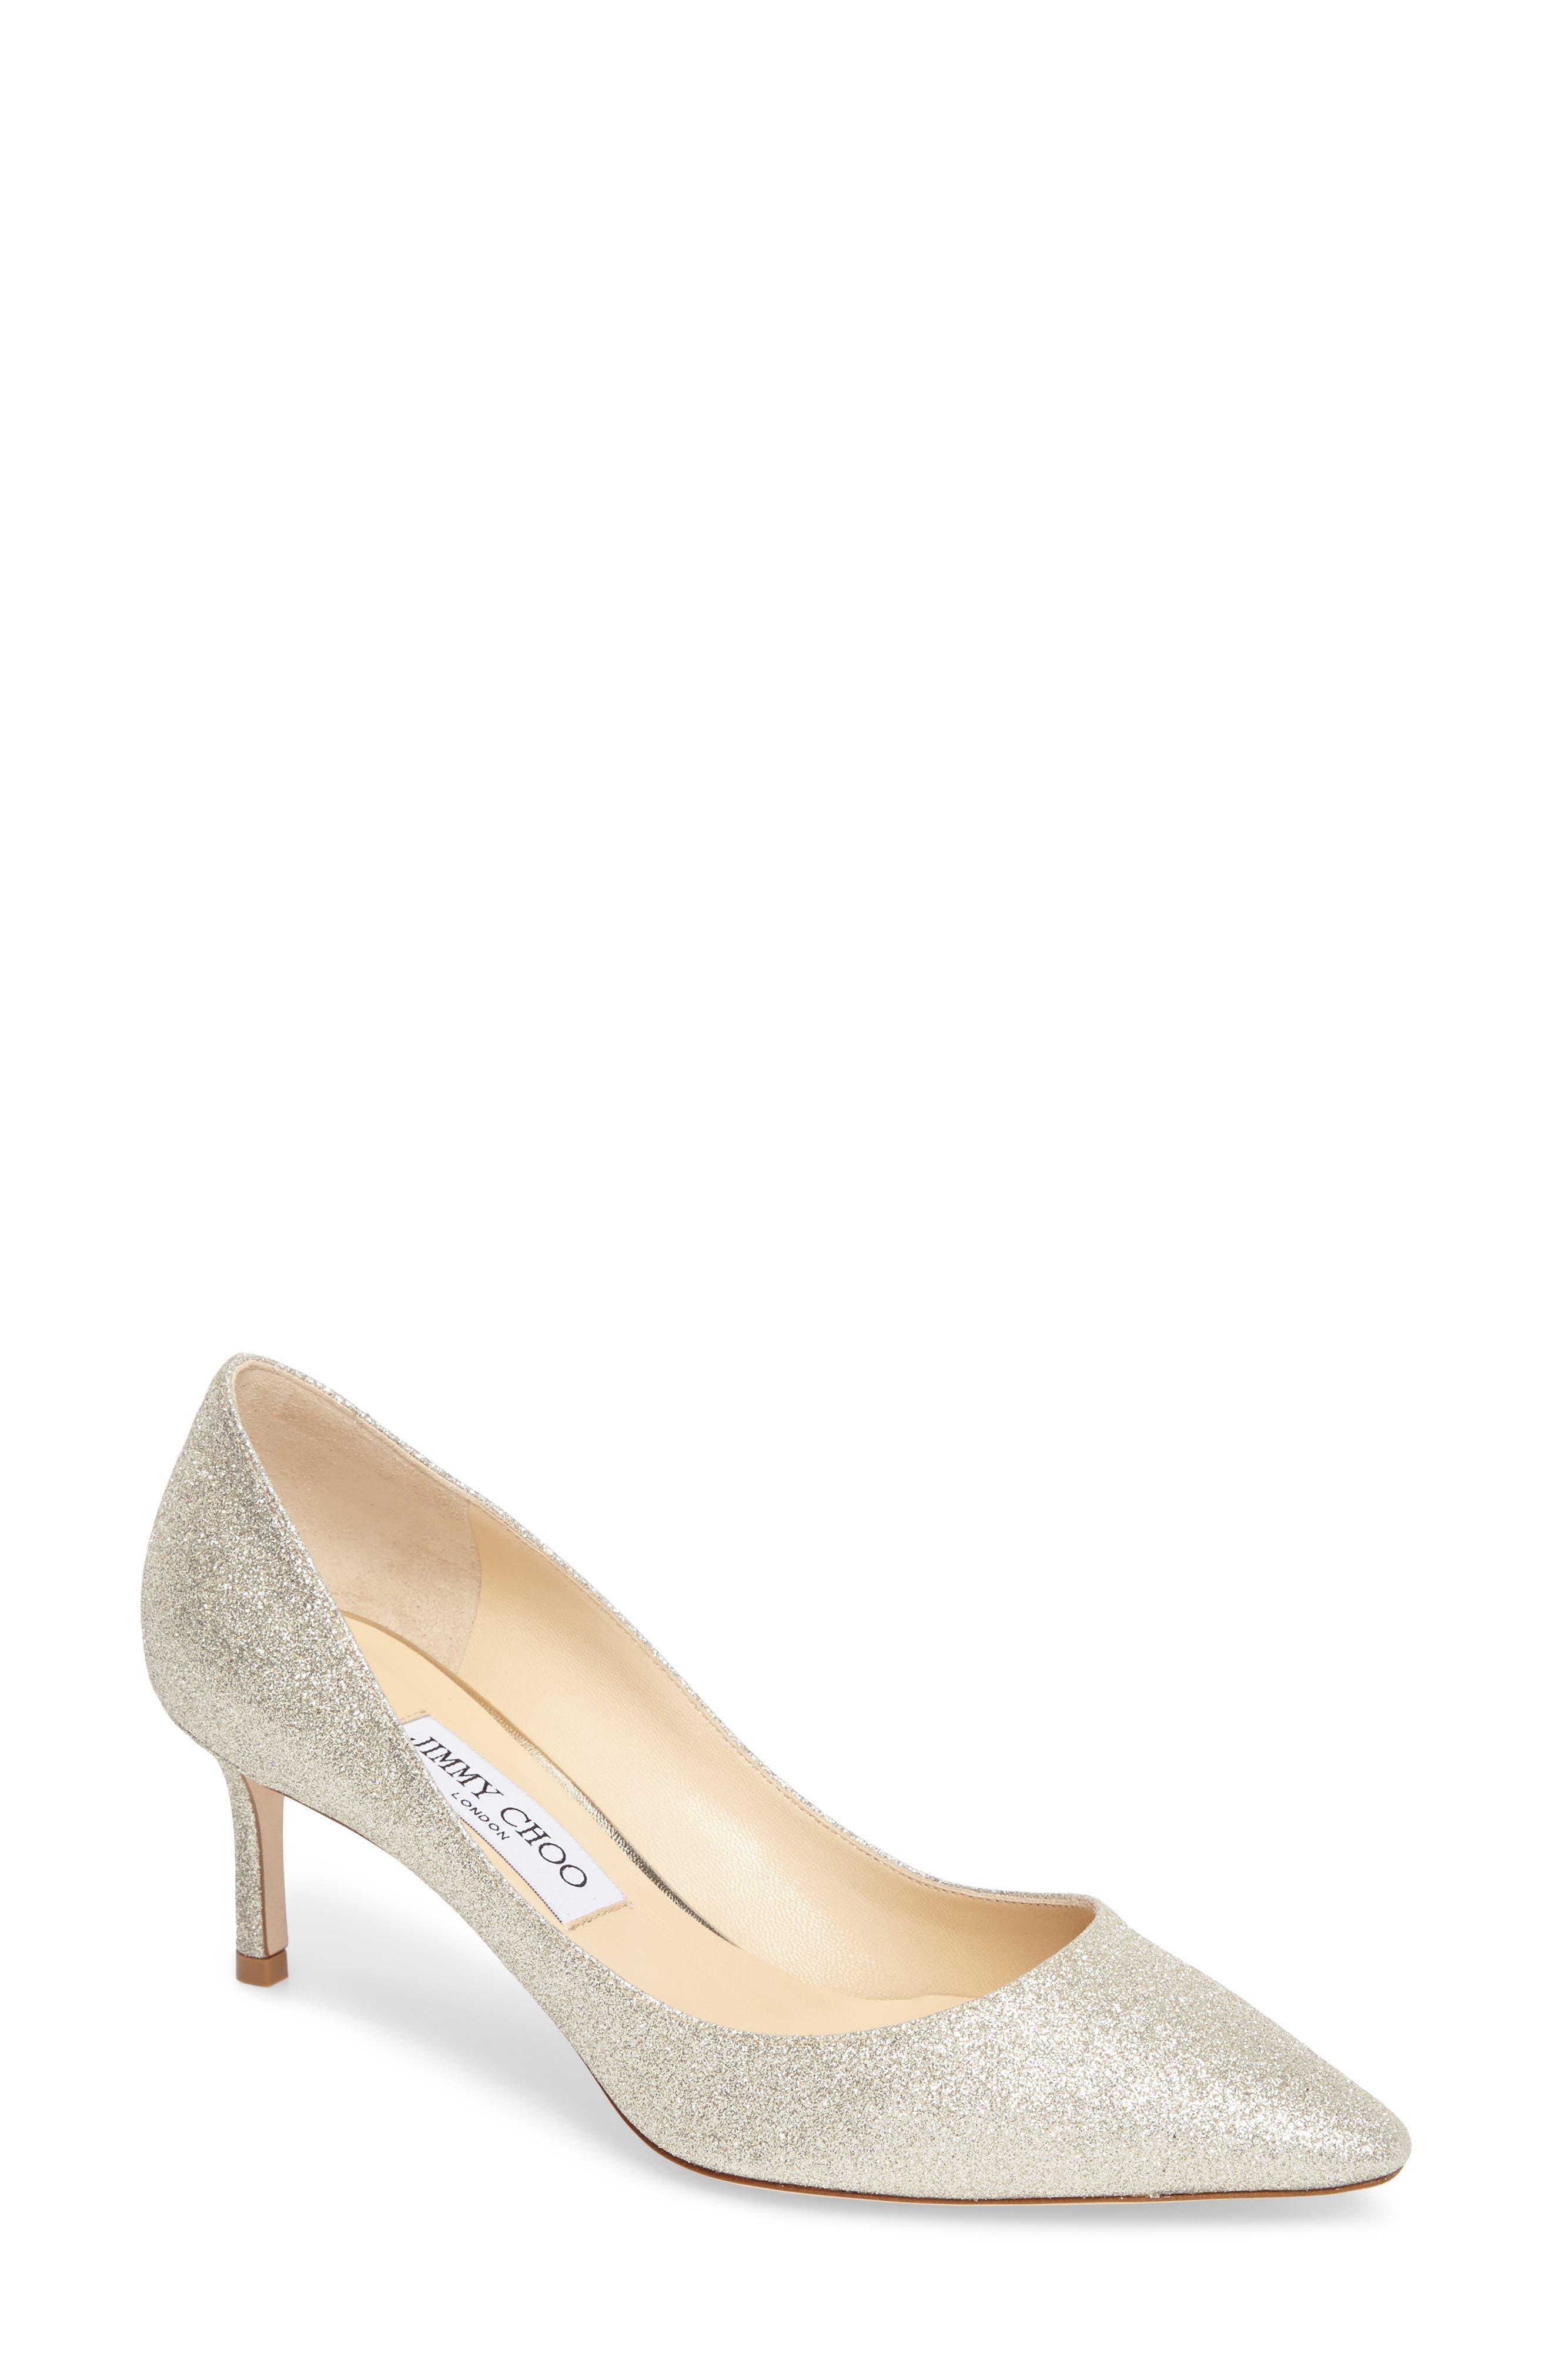 8750097e9 Women's Jimmy Choo Wedding Shoes | Nordstrom